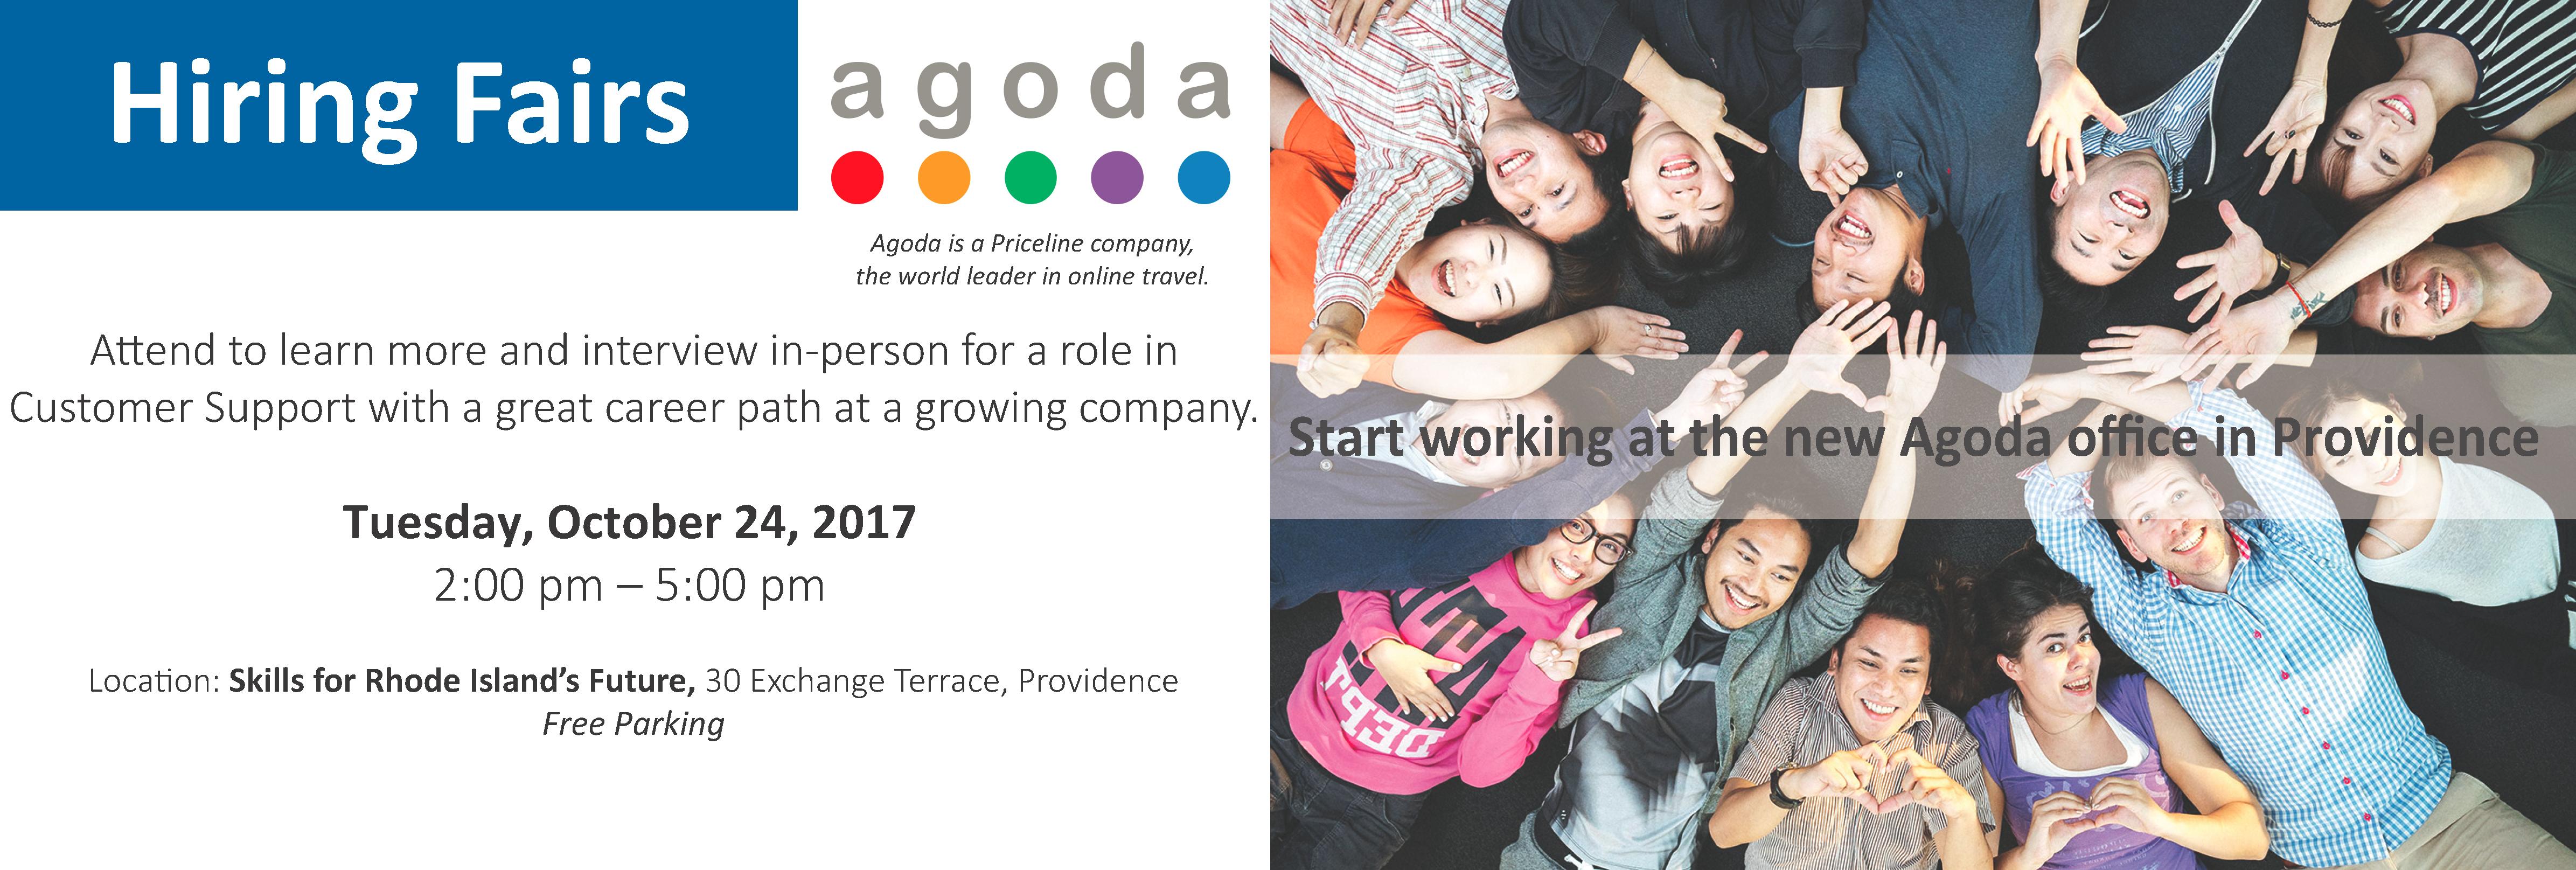 Agoda Event Website Banner.ai Oct 24.17